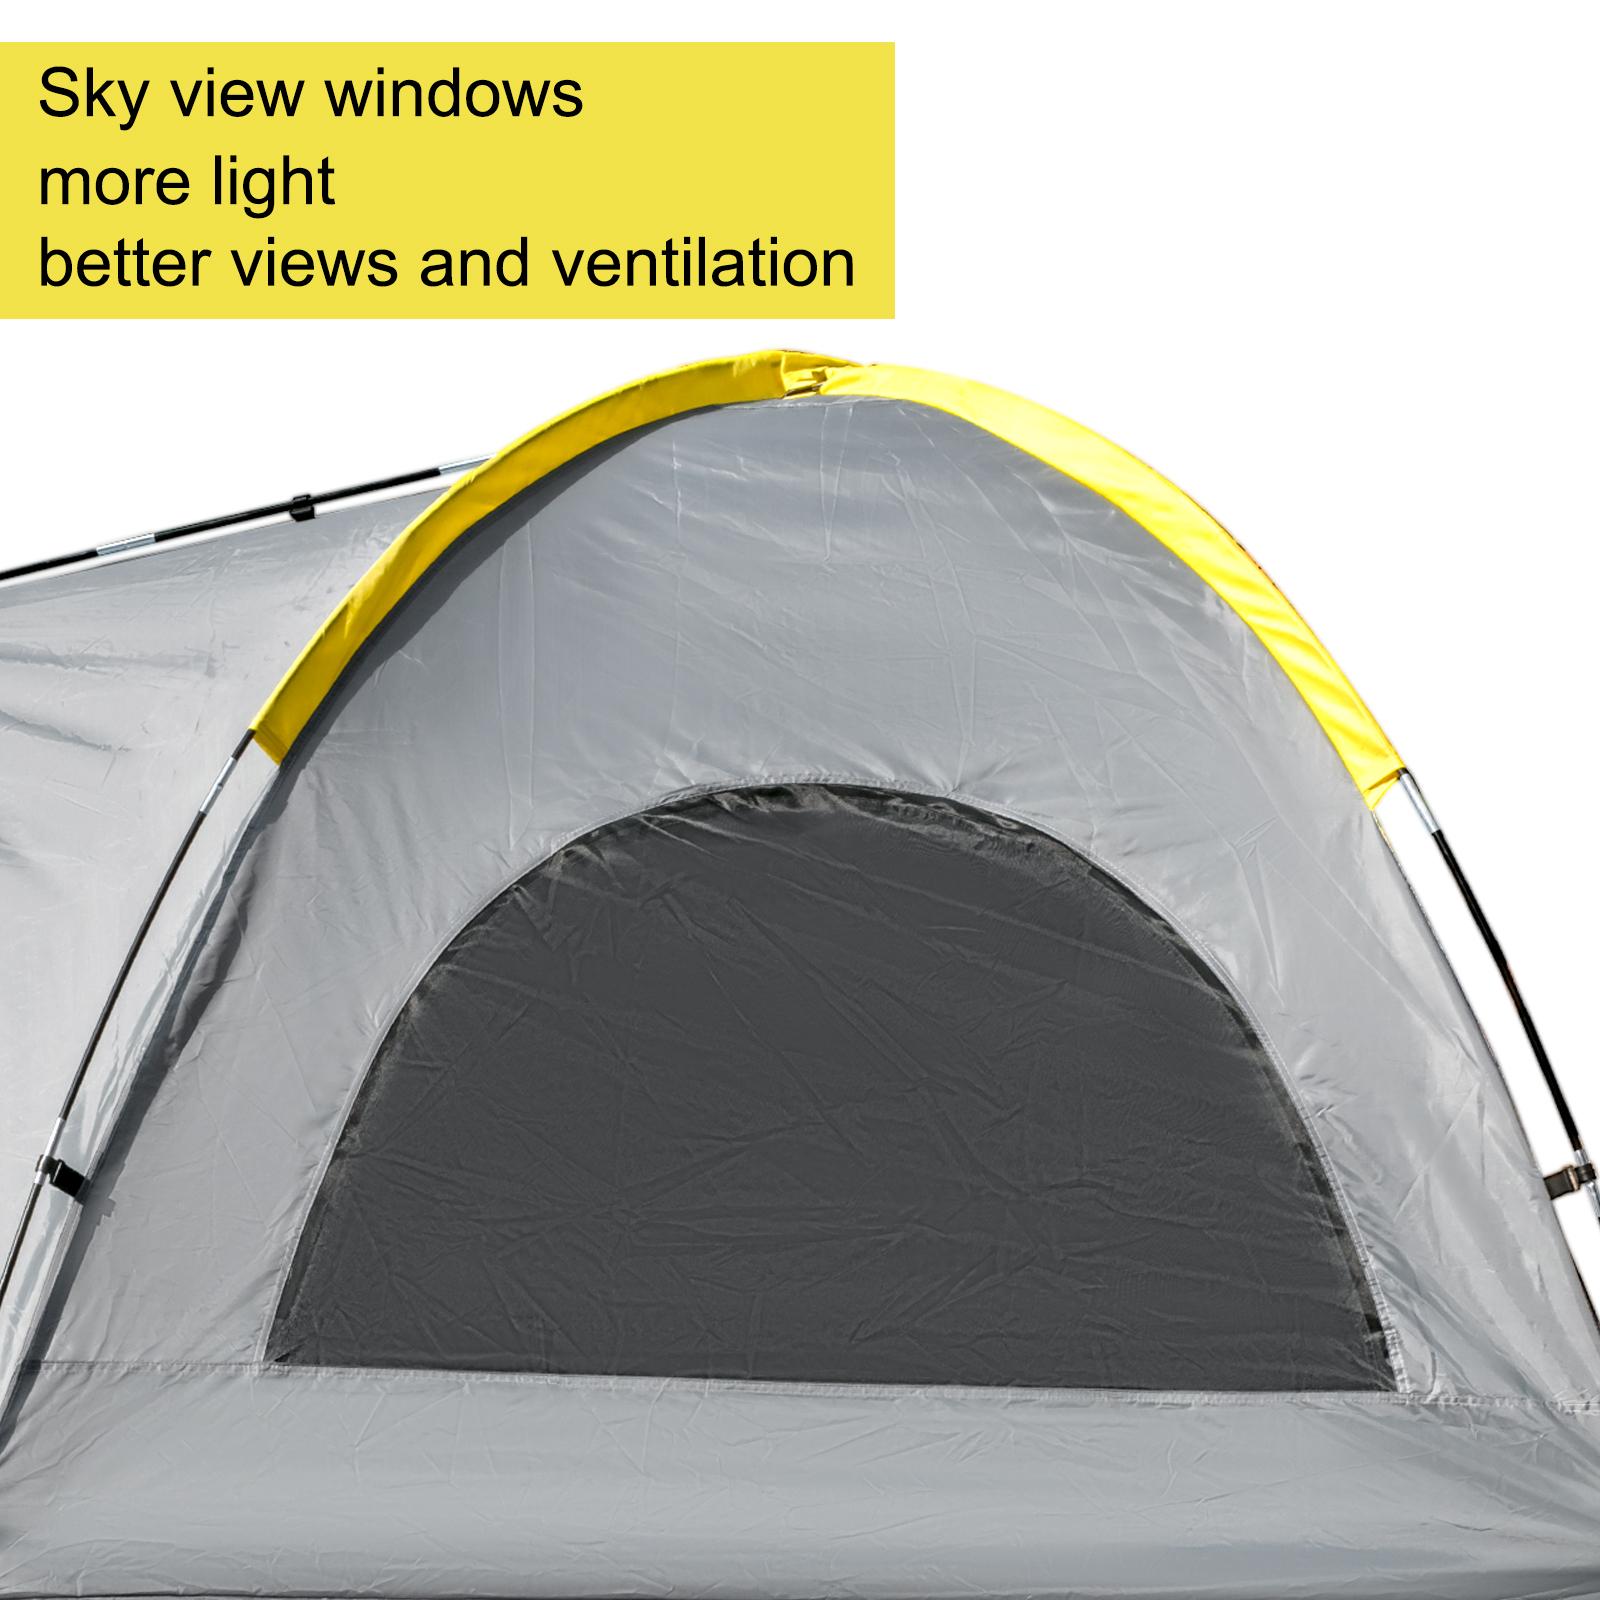 thumbnail 31 - VEVOR Truck Tent Truck Bed Tent 5' - 8' Pickup Tent Waterproof Outdoor Camping